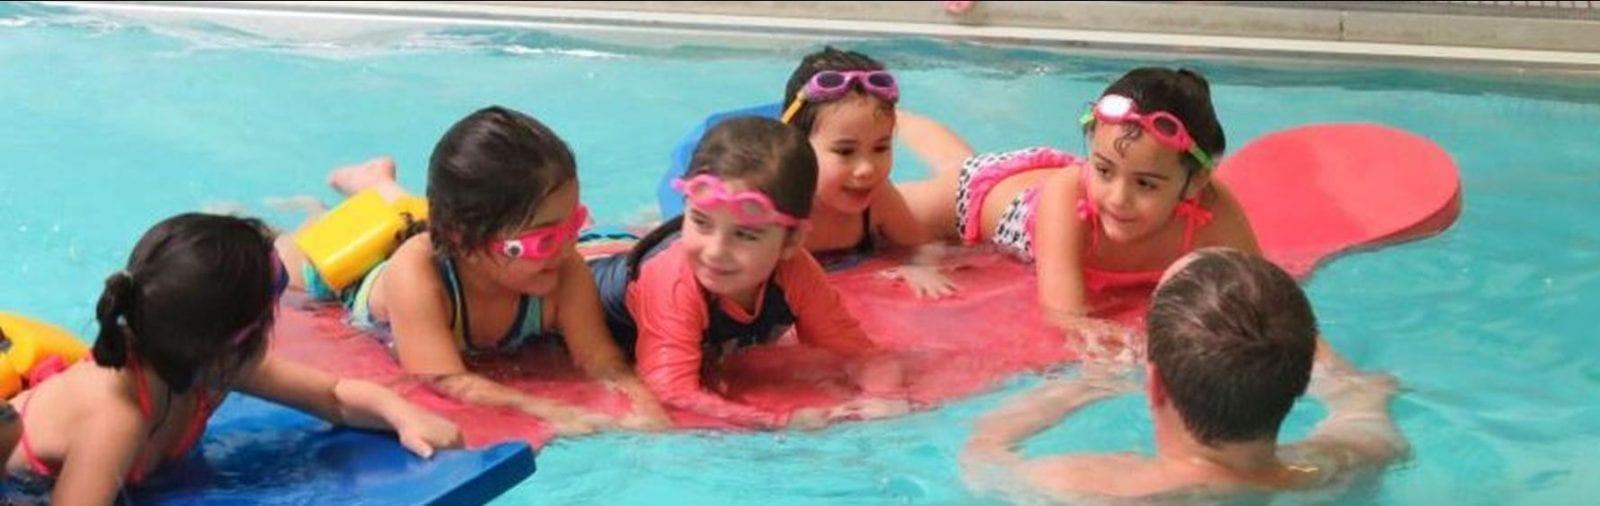 Aquatics Leadership And Safety